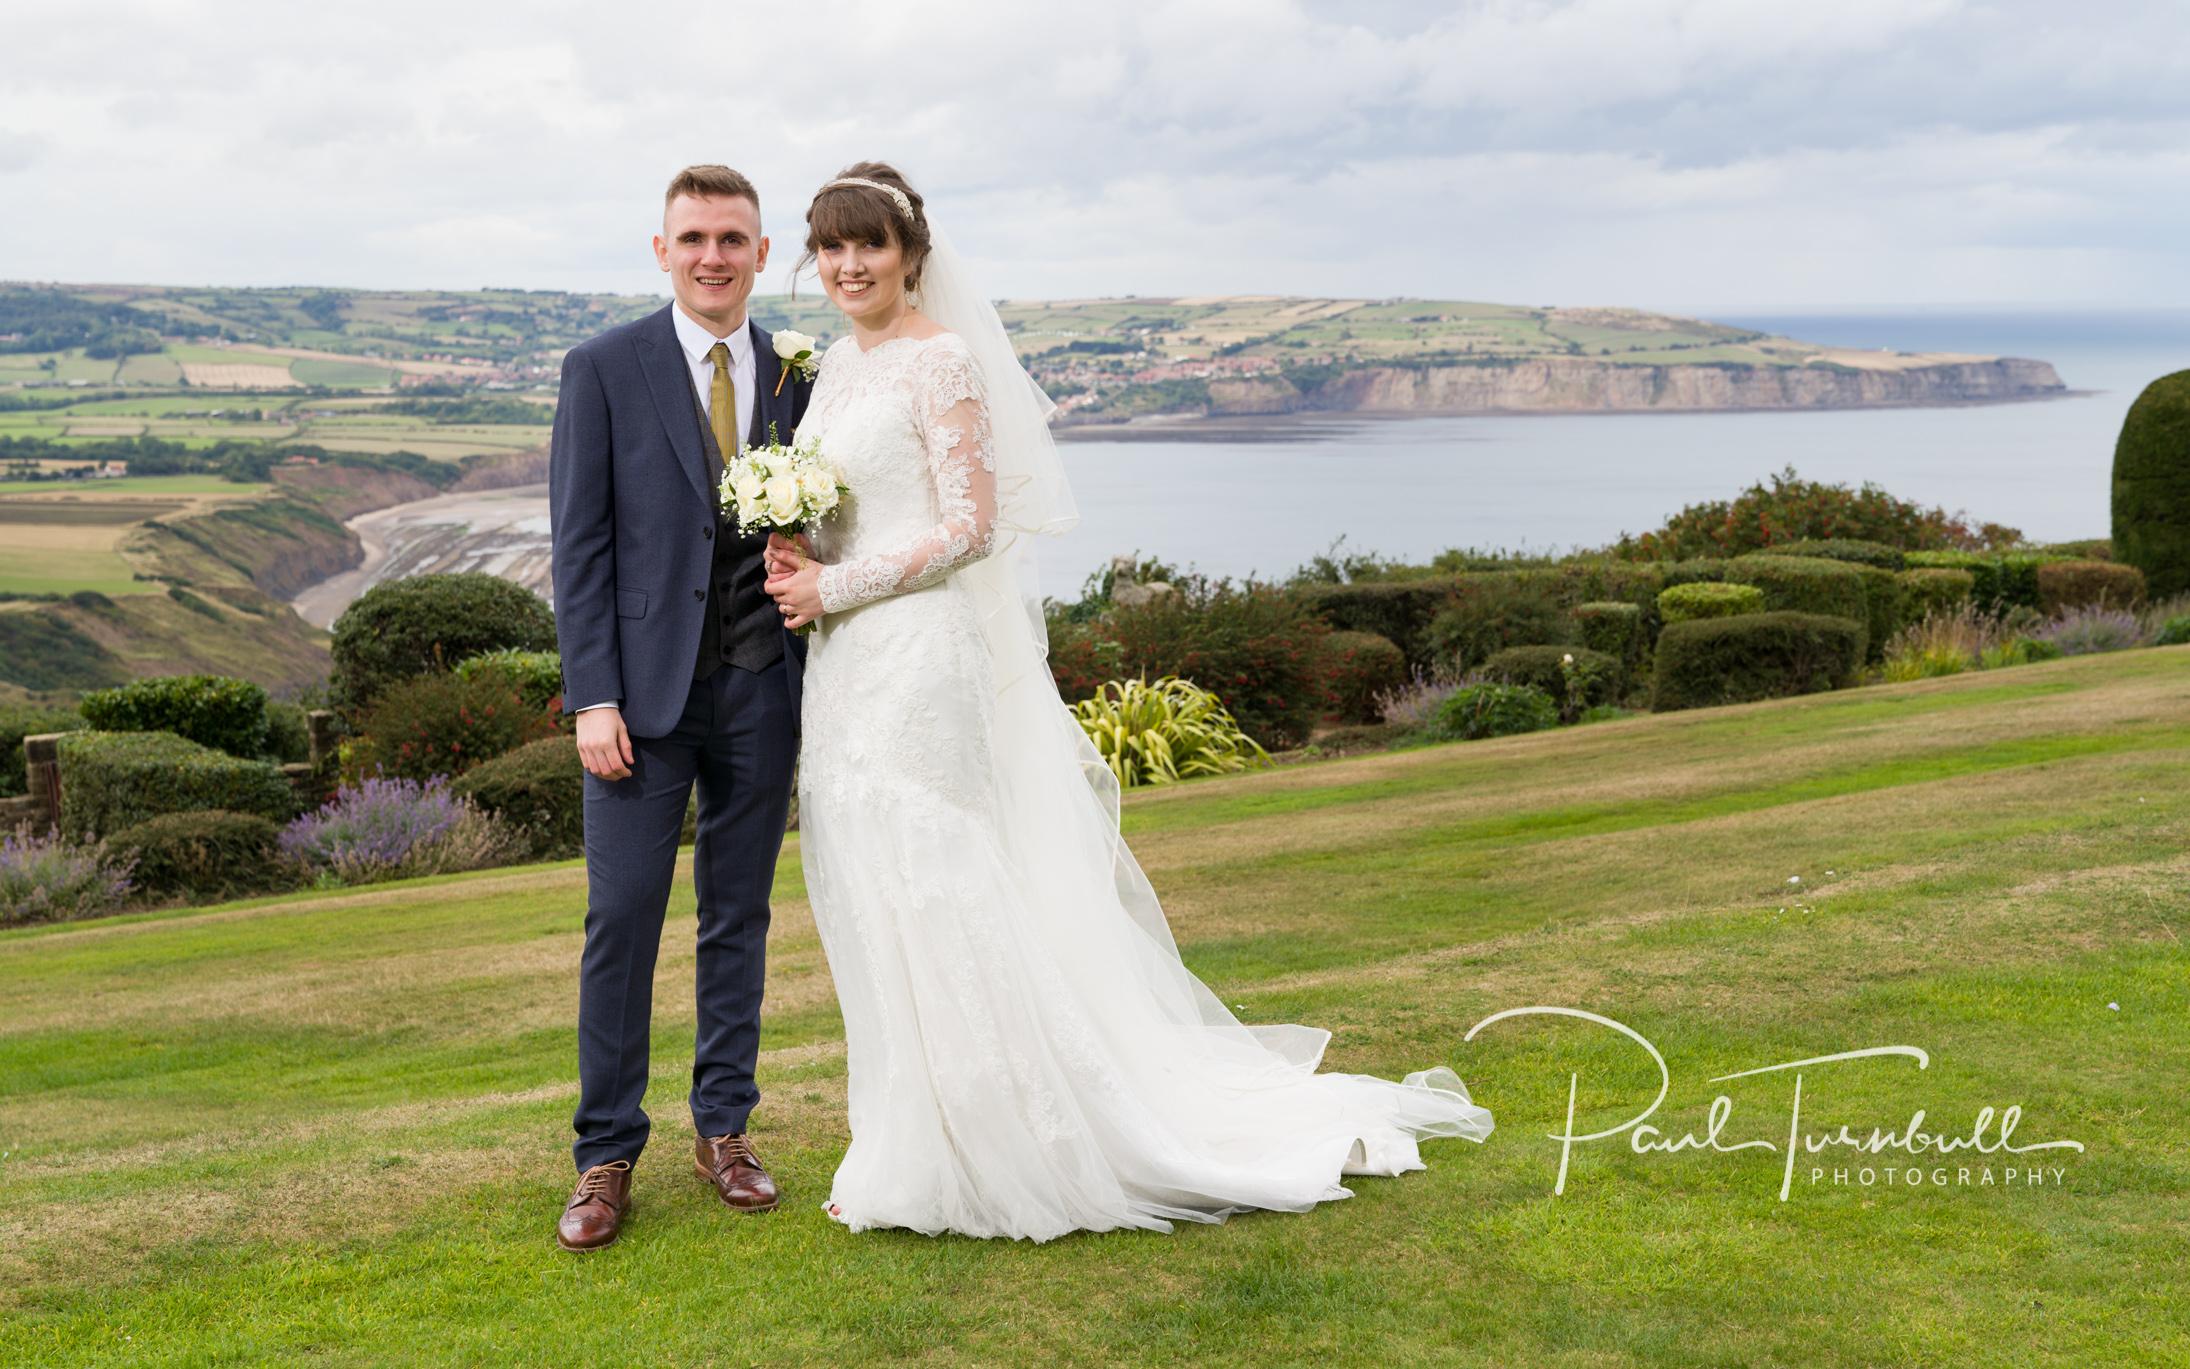 wedding-photographer-raven-hall-ravenscroft--scarborough-yorkshire-lucy-ryan-065.jpg